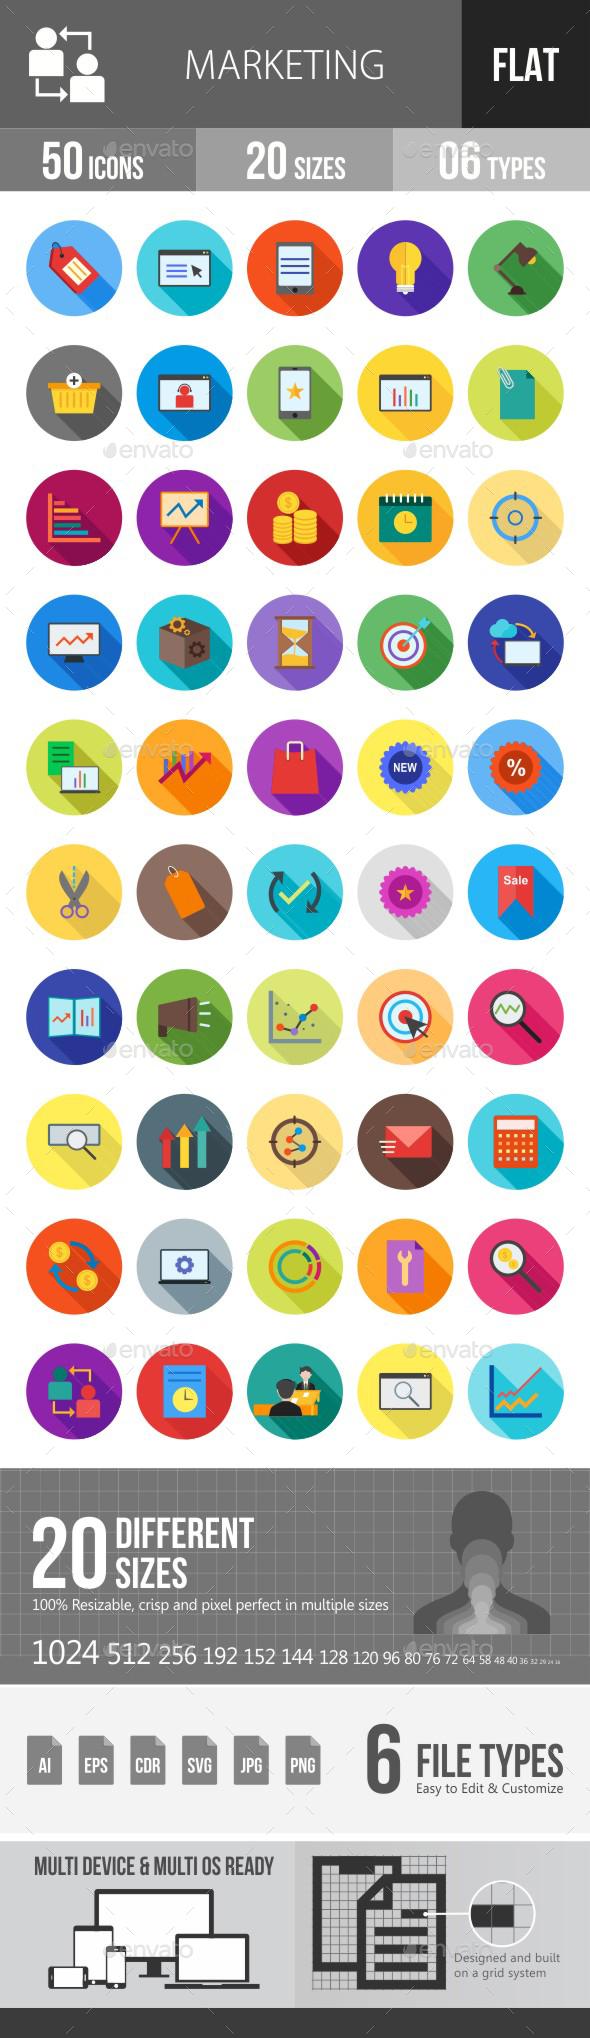 Marketing Flat Shadowed Icons - Icons